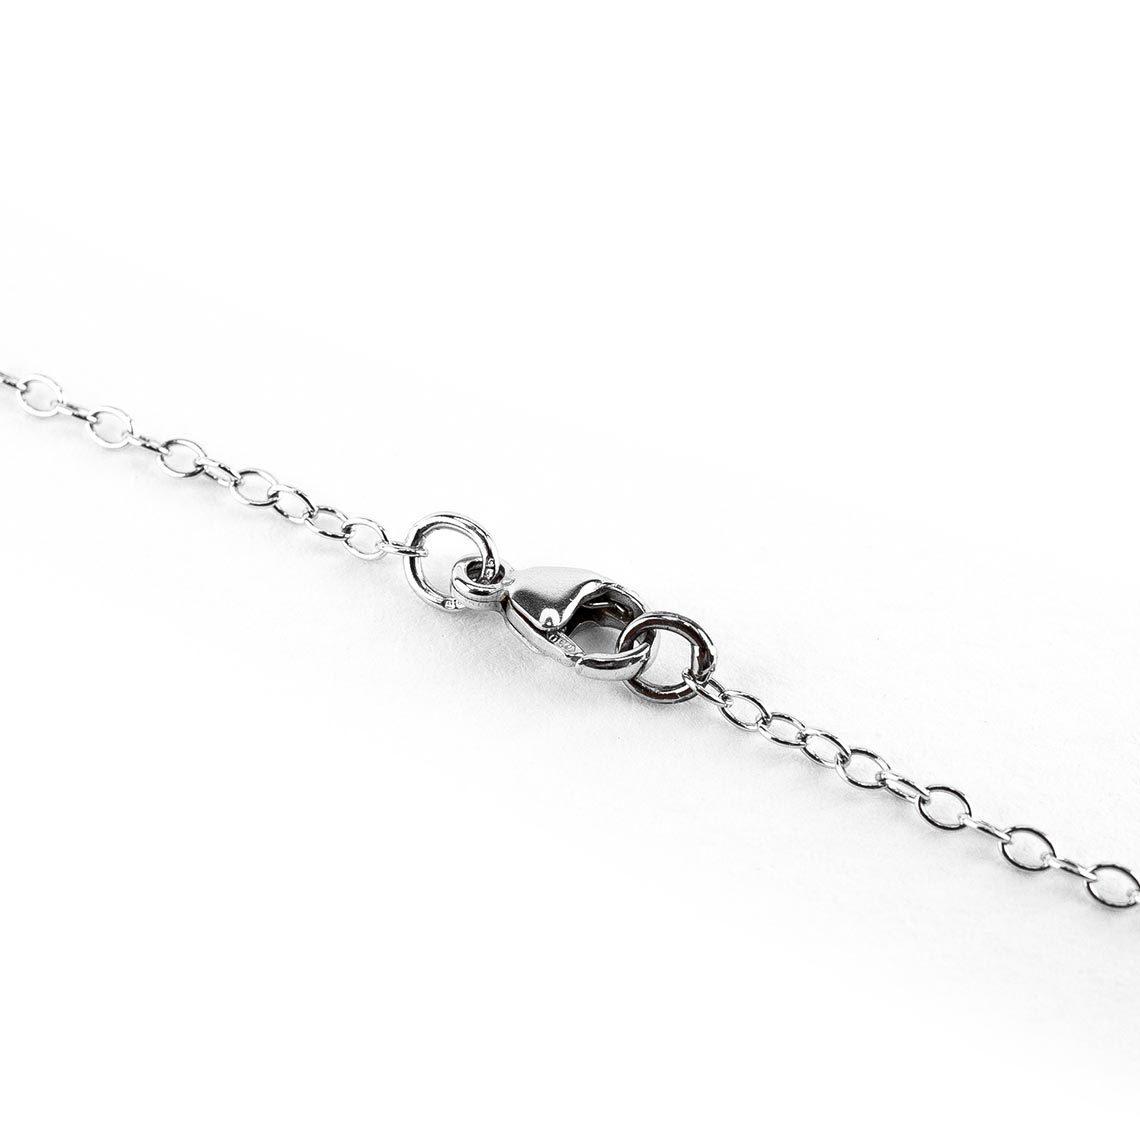 Trace Chain